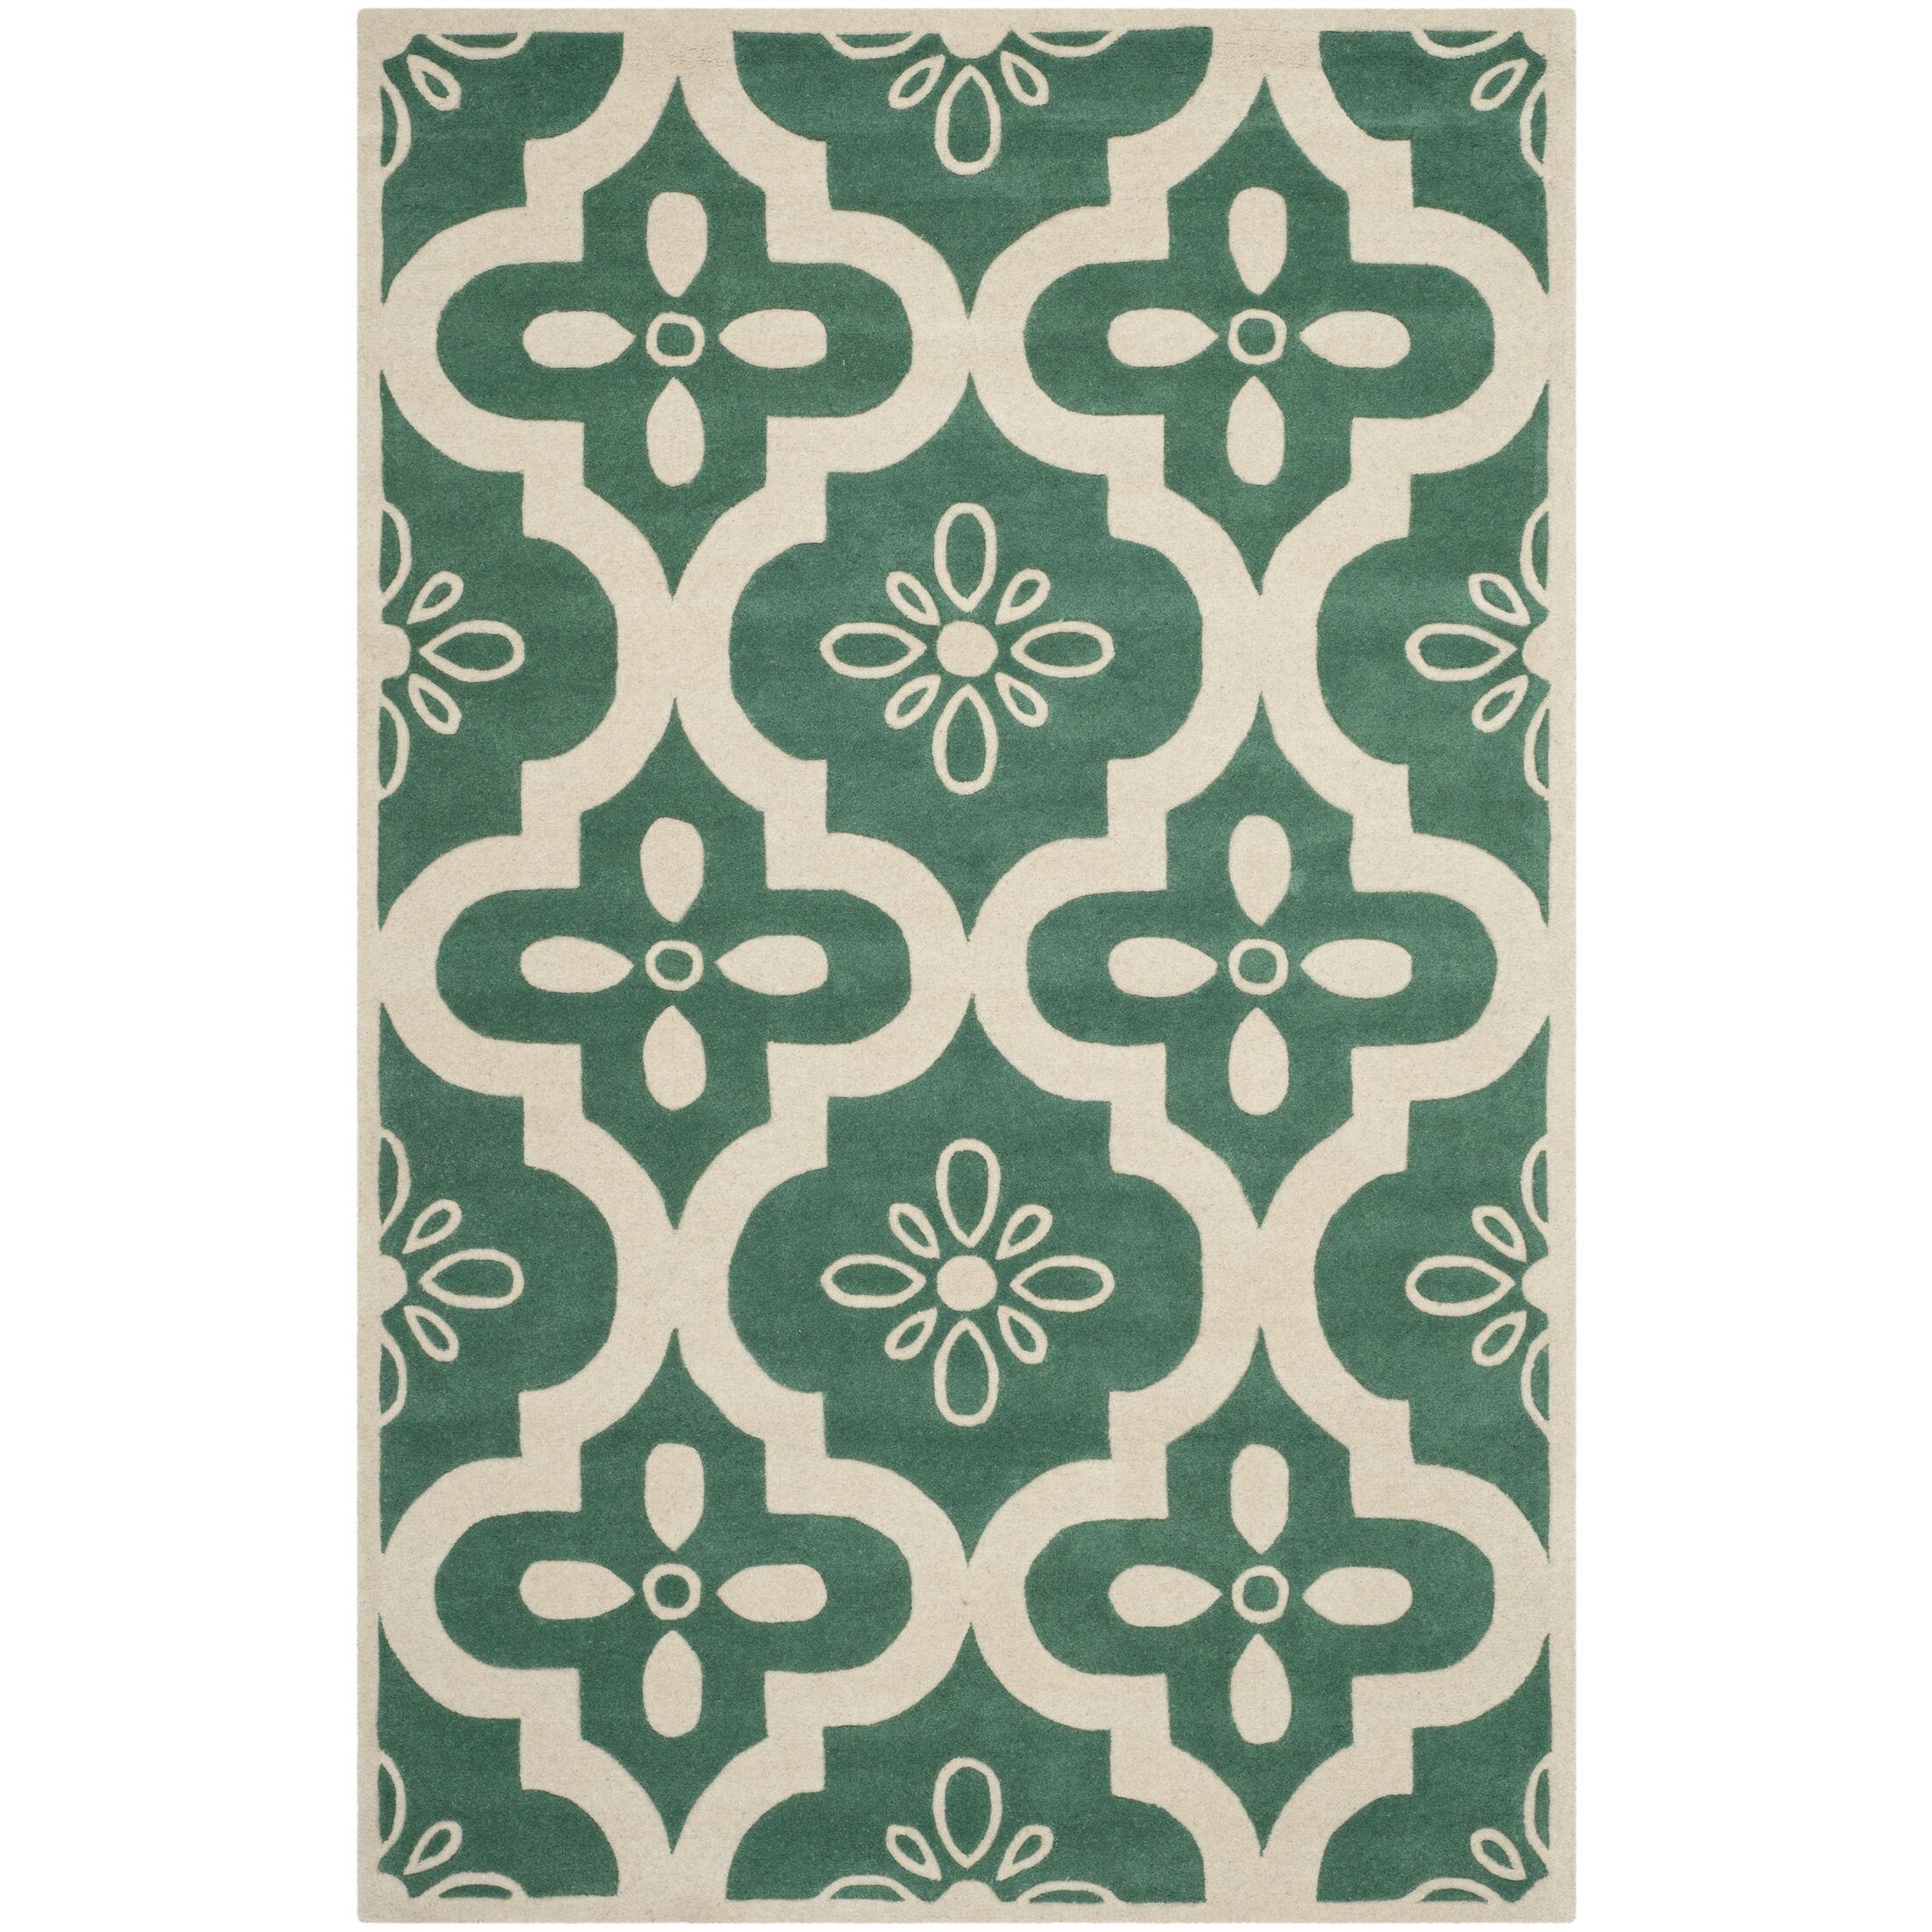 Wilkin Moroccan Hand-Tufted Wool Tea/Ivory Area Rug Rug Size: Rectangle 5' x 8'